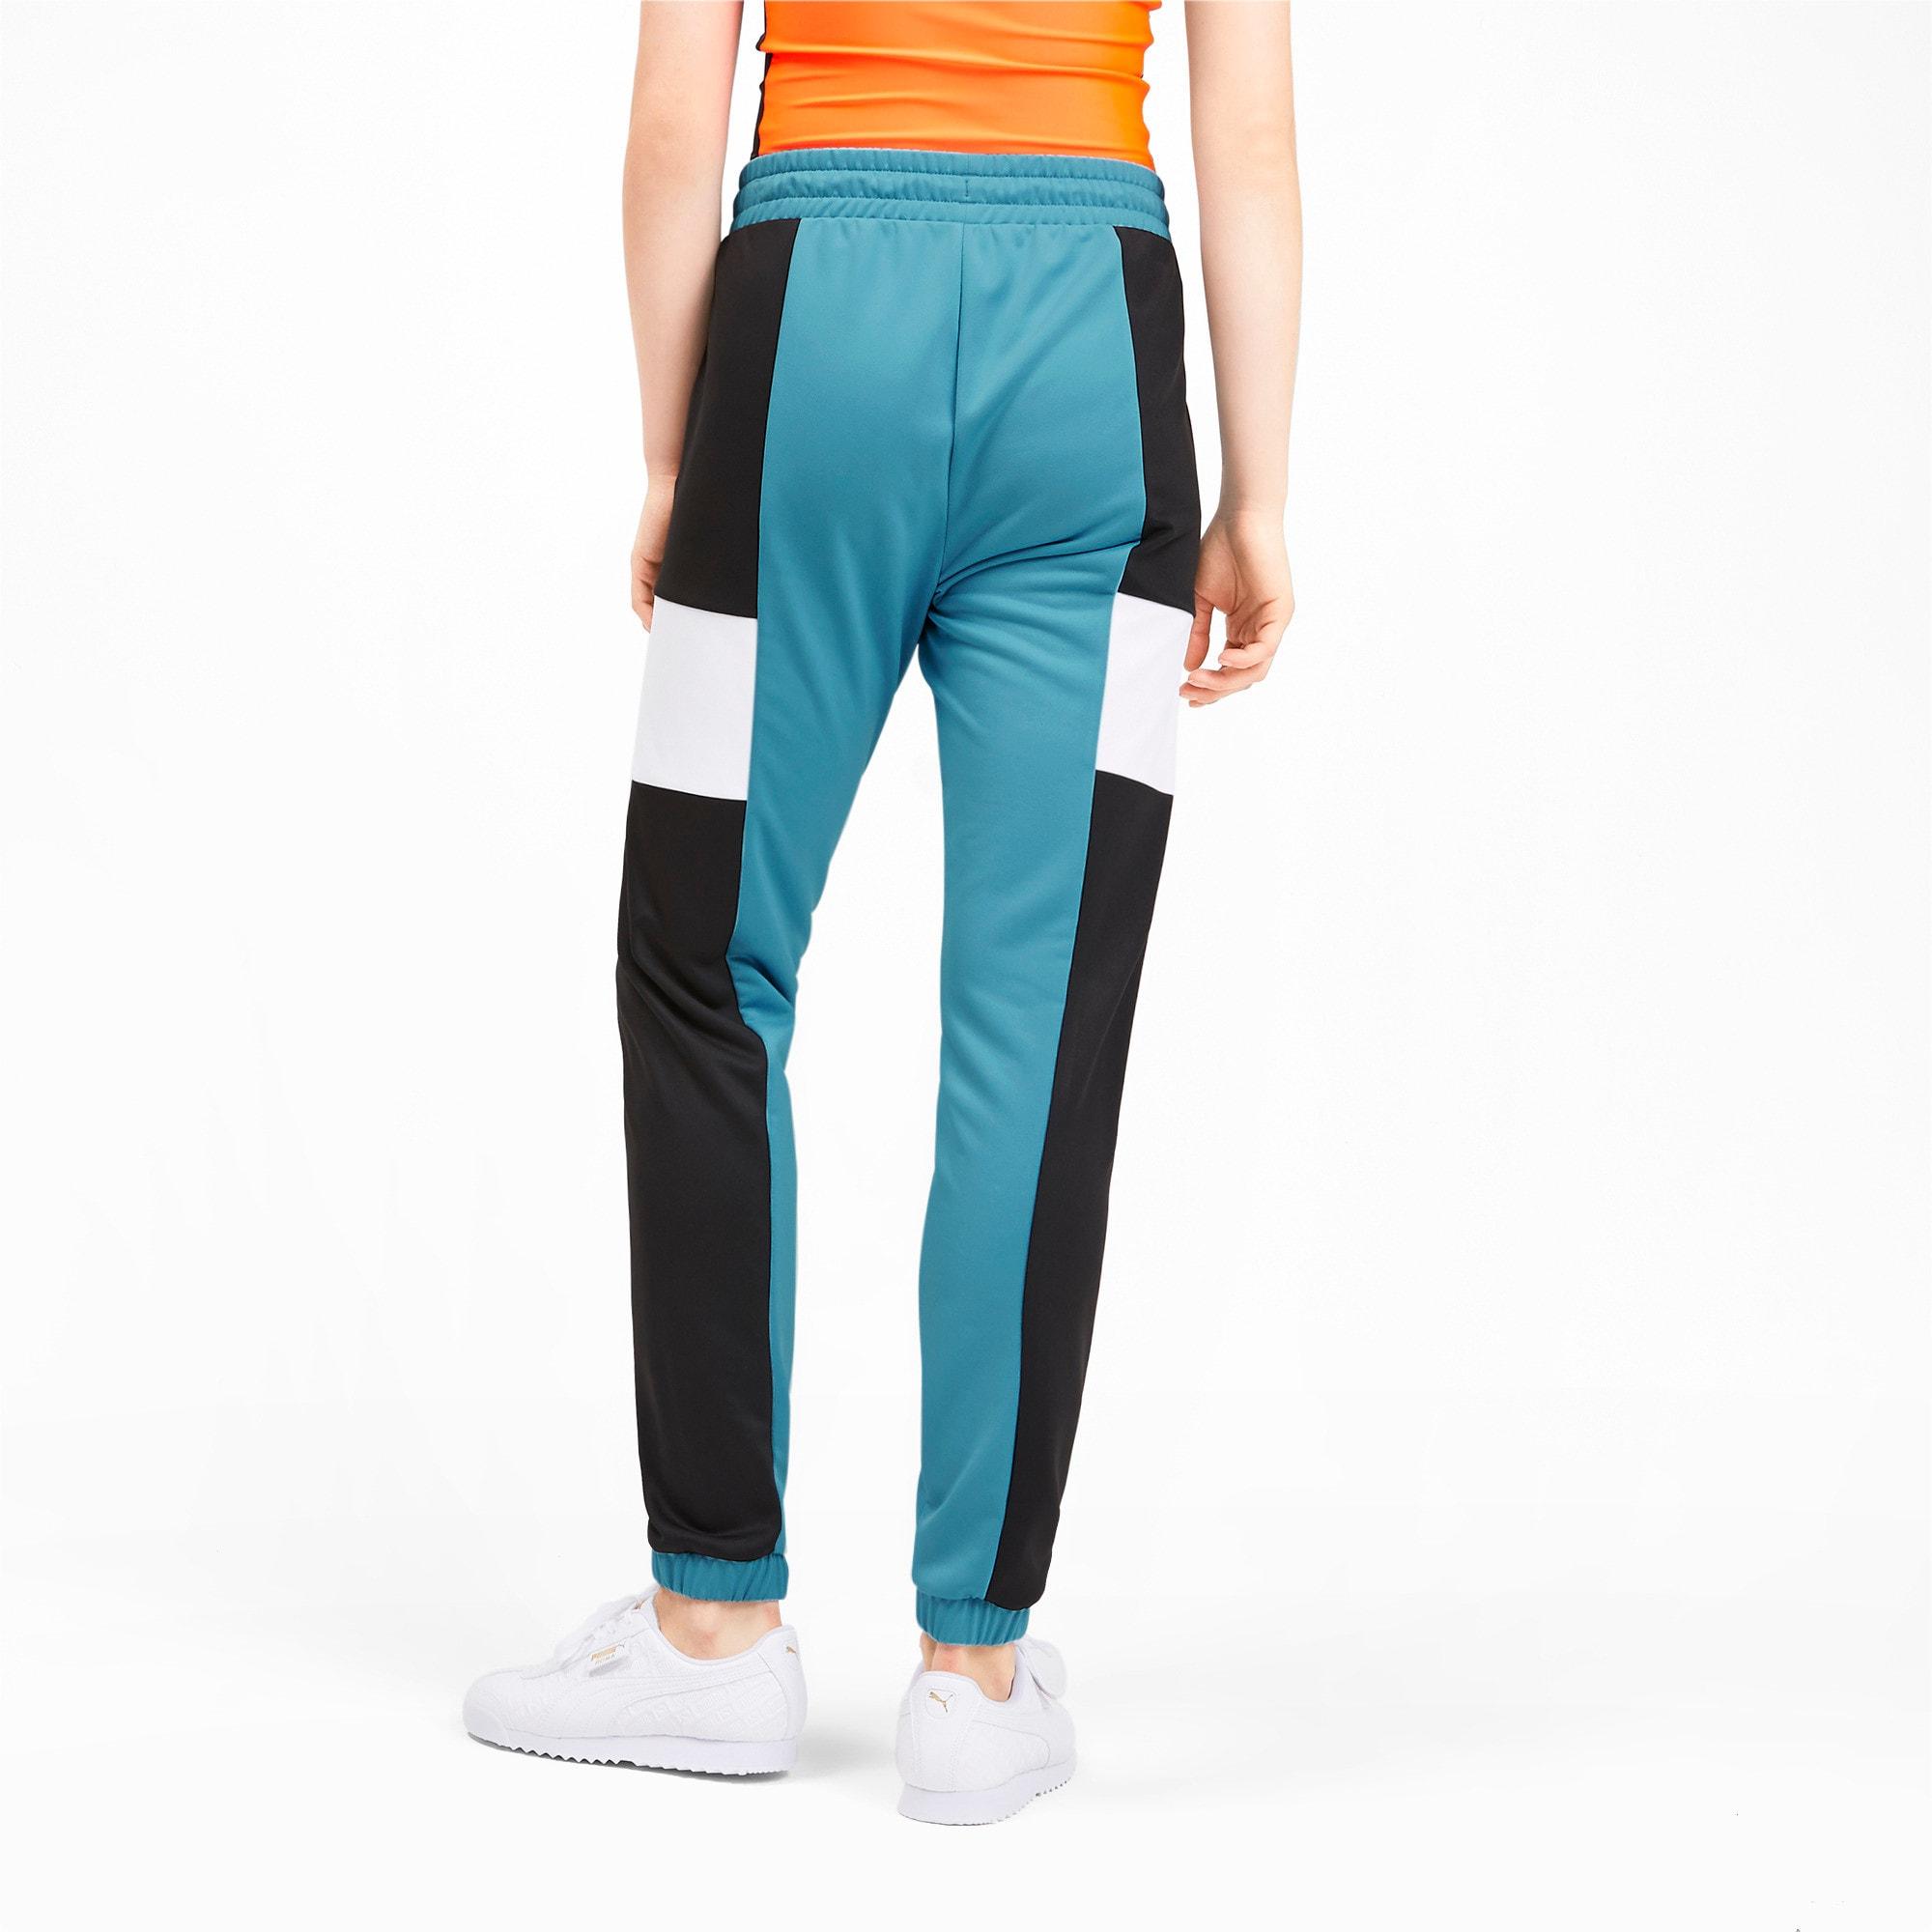 Miniatura 2 de Pantalones deportivos PUMA XTG para mujer, Milky Blue, mediano